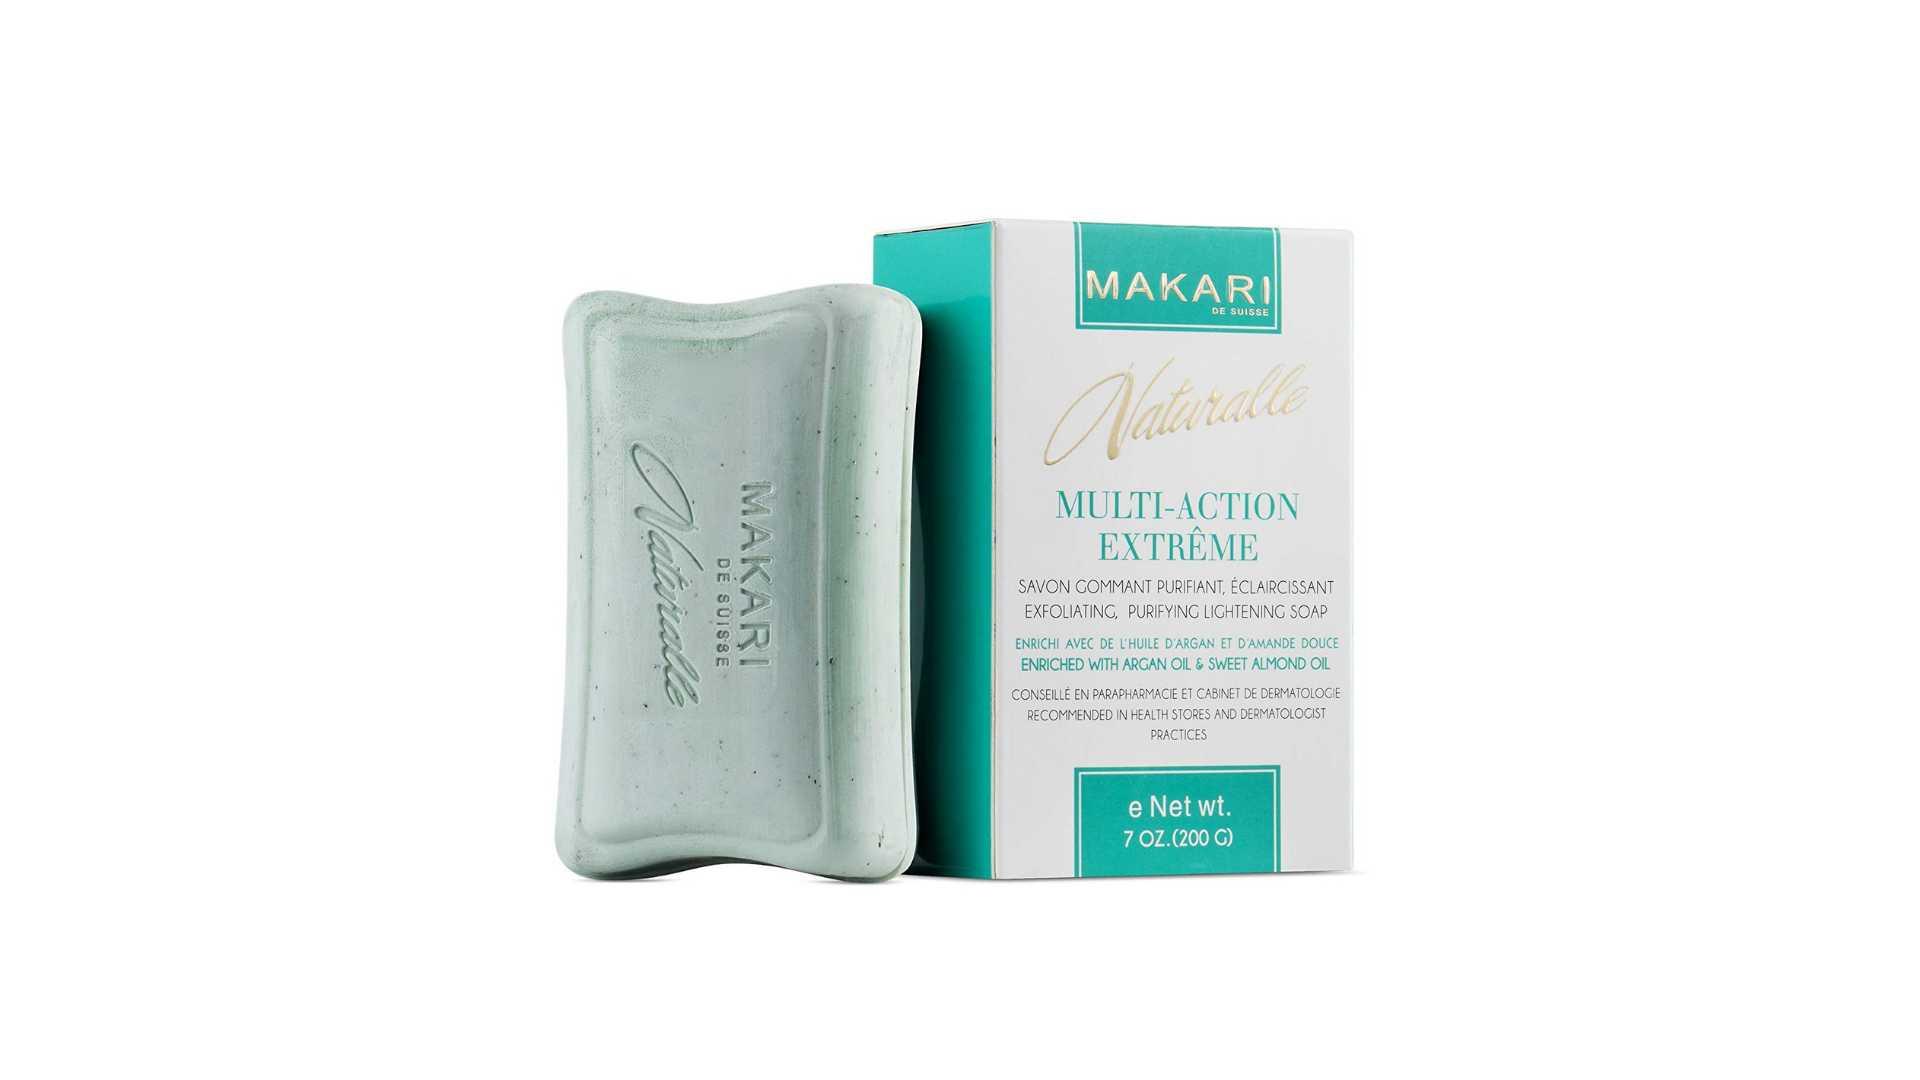 Makari Naturalle Multi-Action Extreme Skin Lightening Exfoliating Soap